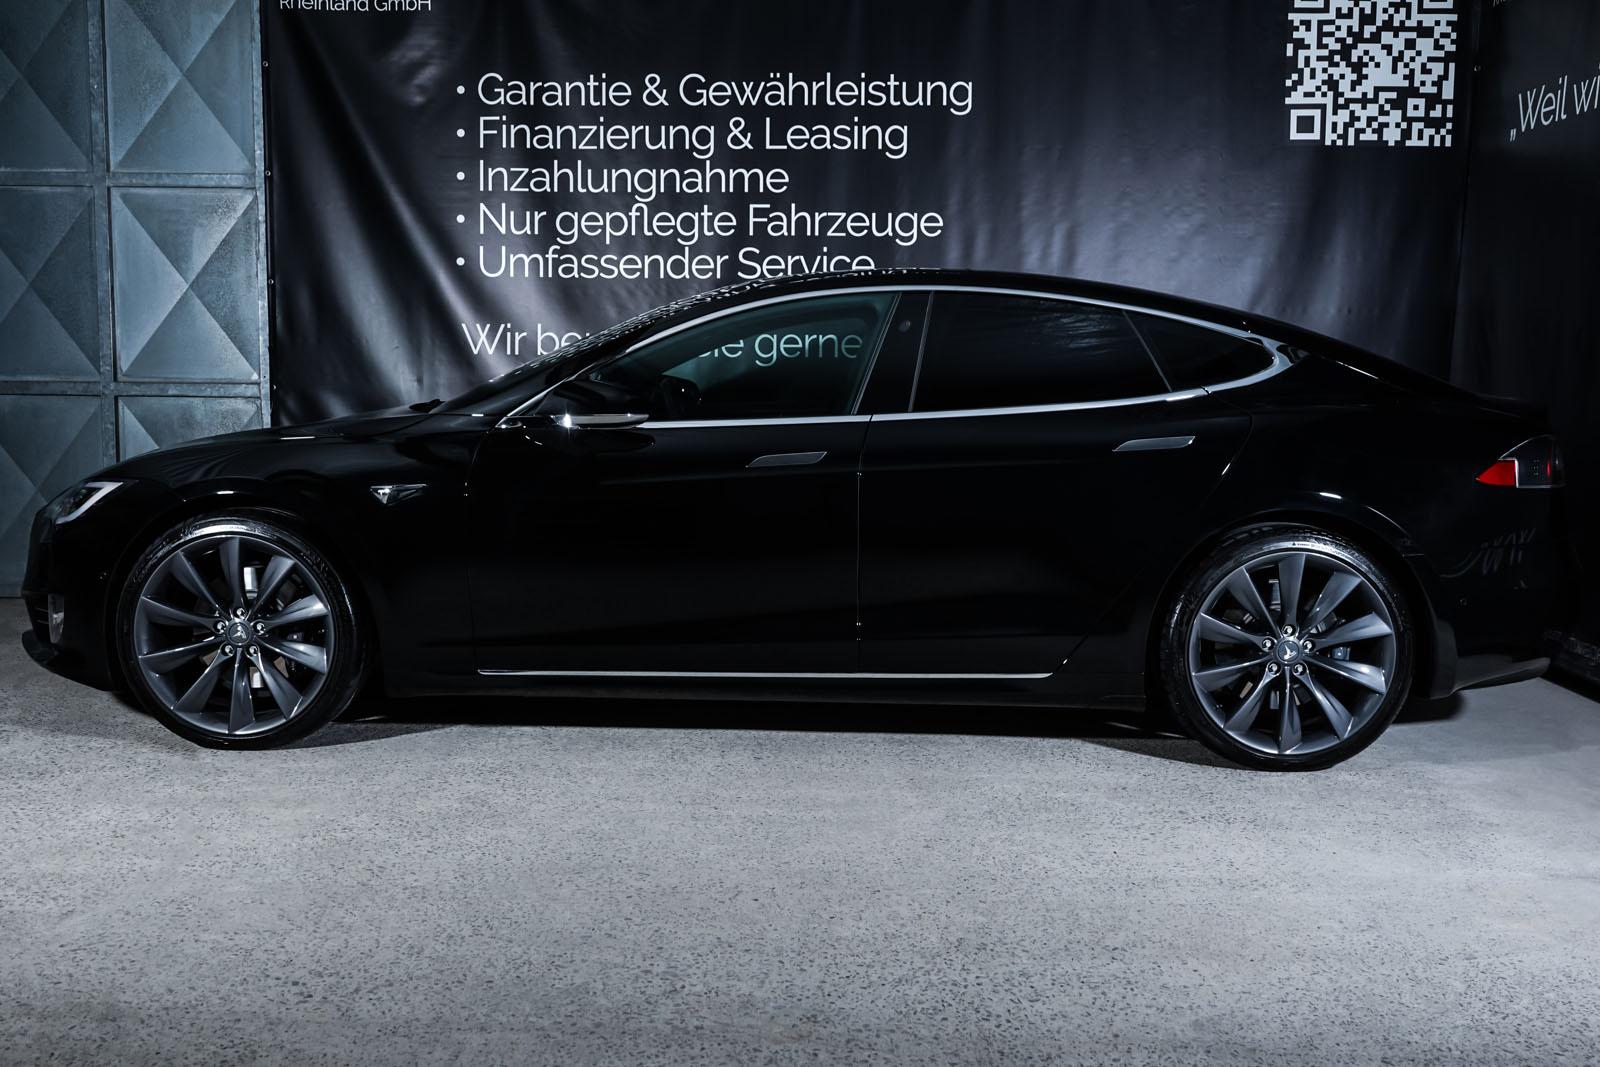 Tesla_ModelS_Schwarz_Schwarz_TES-6166_5_w